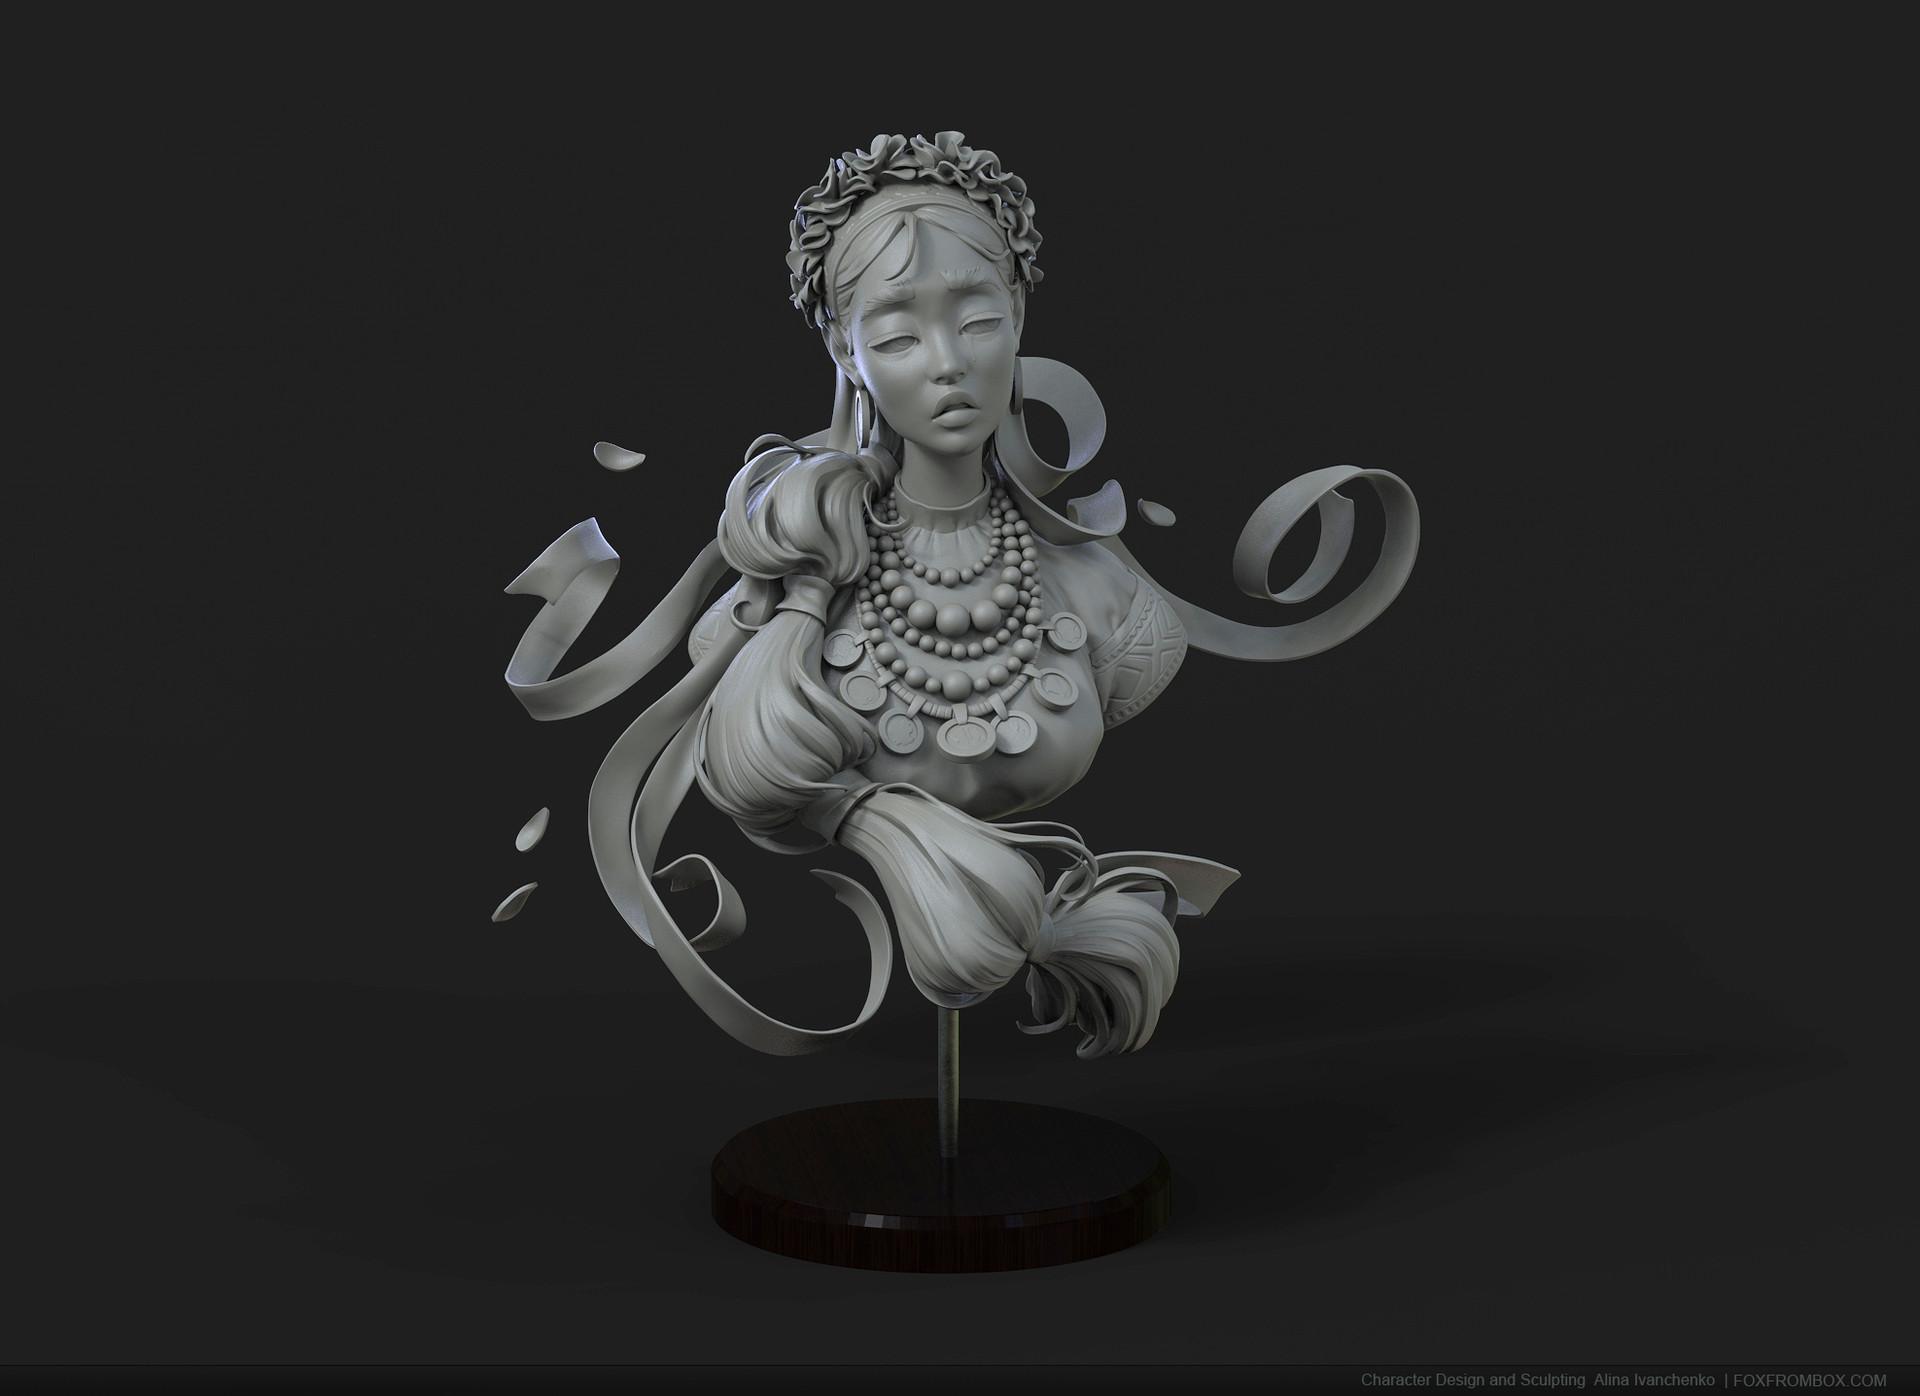 Alina ivanchenko slav bust keyshot01